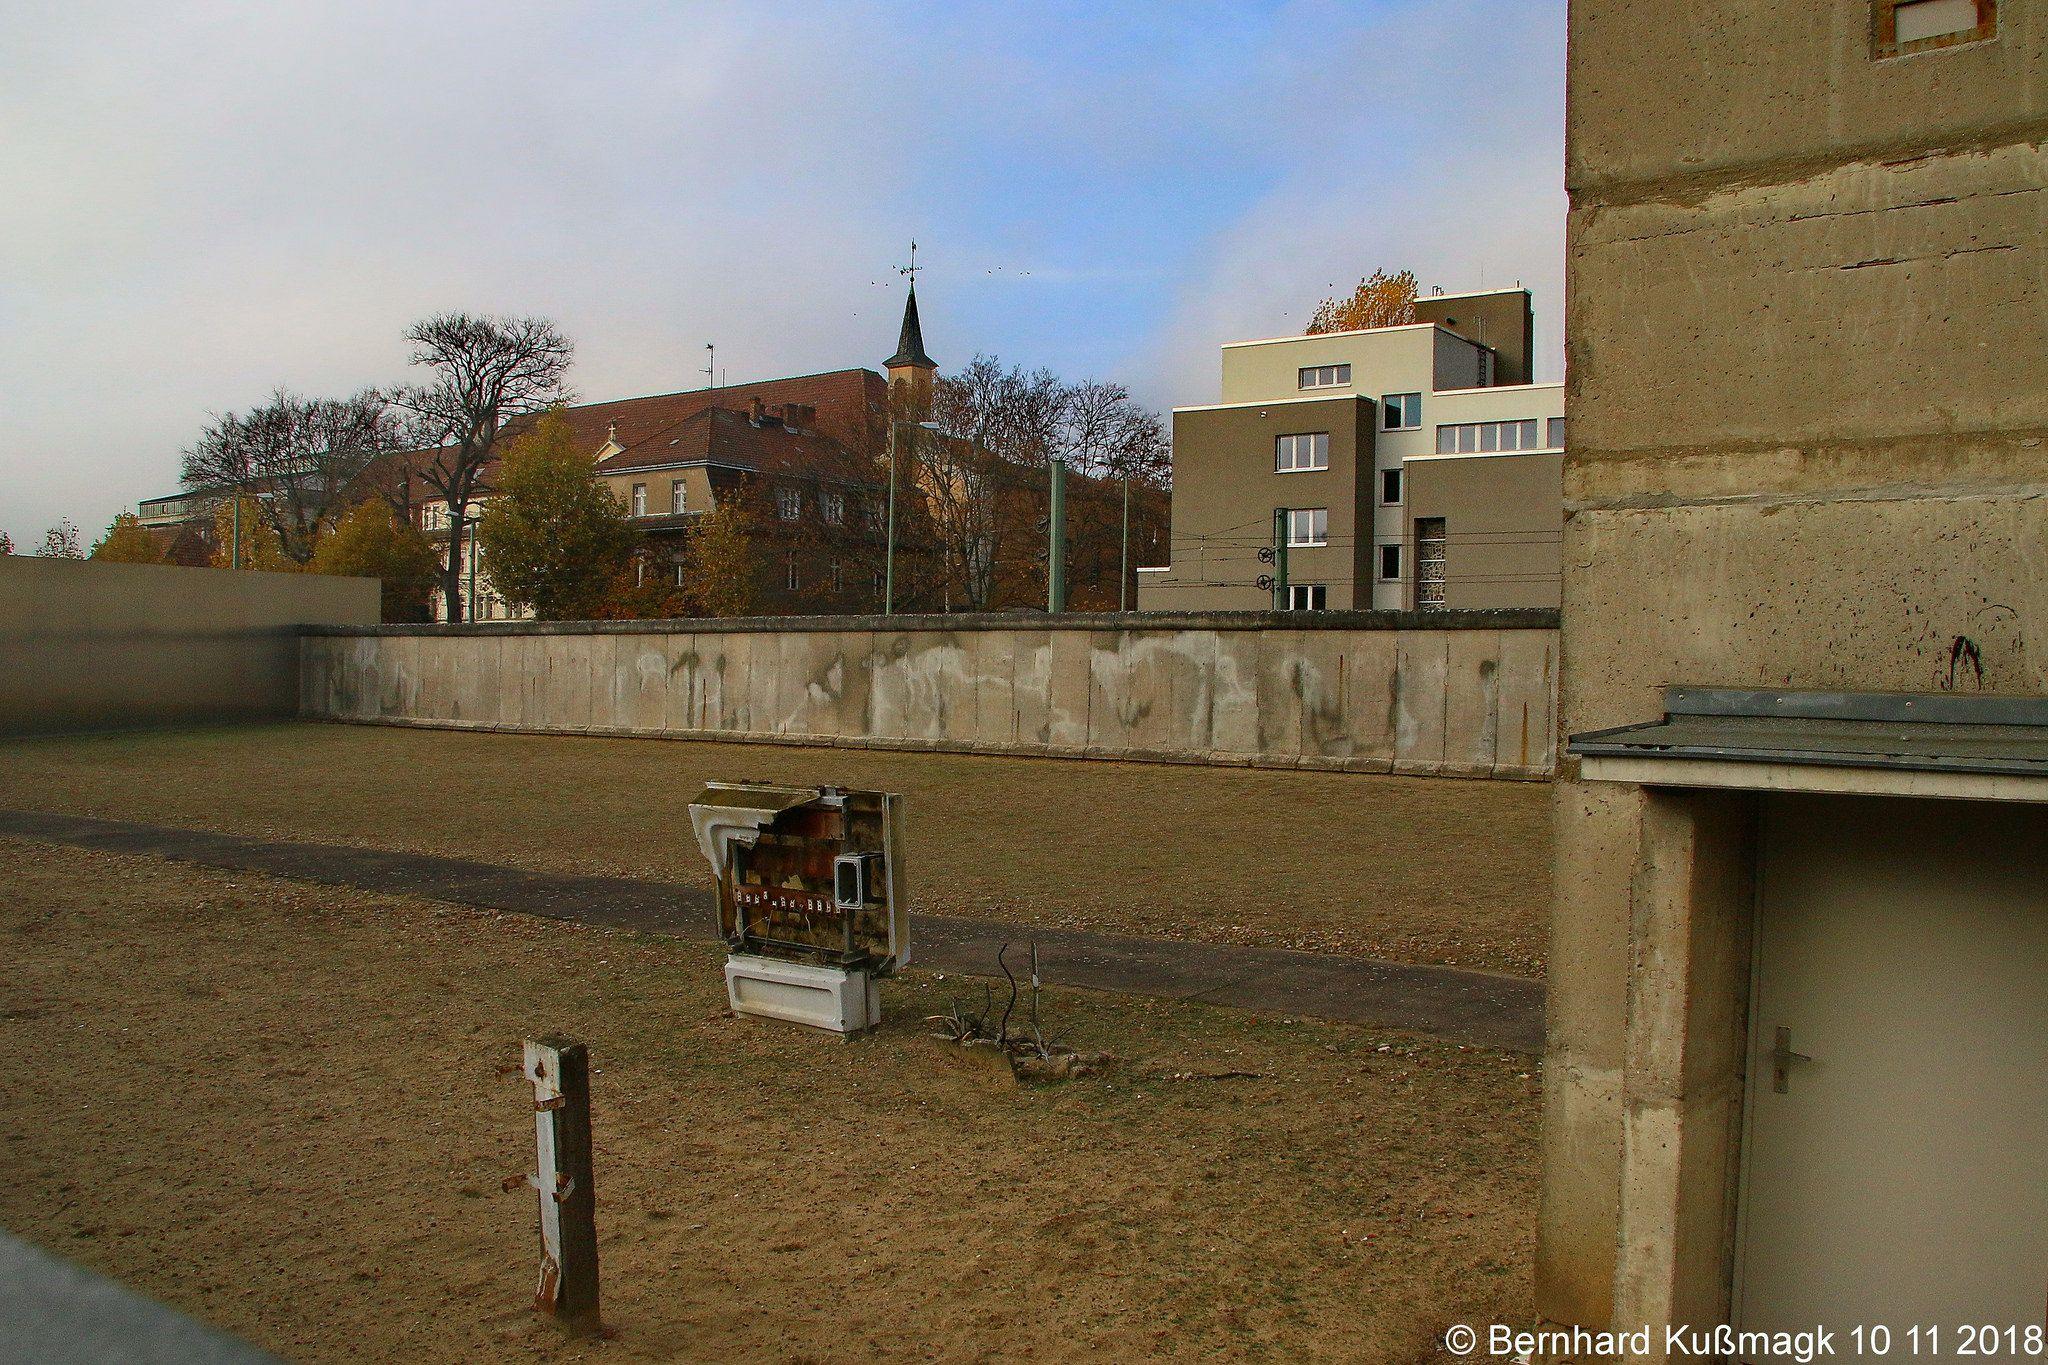 Europa Deutschland Berlin Mitte Bernauer Strasse Nahe Ecke Ackerstrasse Gedenkstatte Berliner Mauer Berlin Wall Berlin Wall